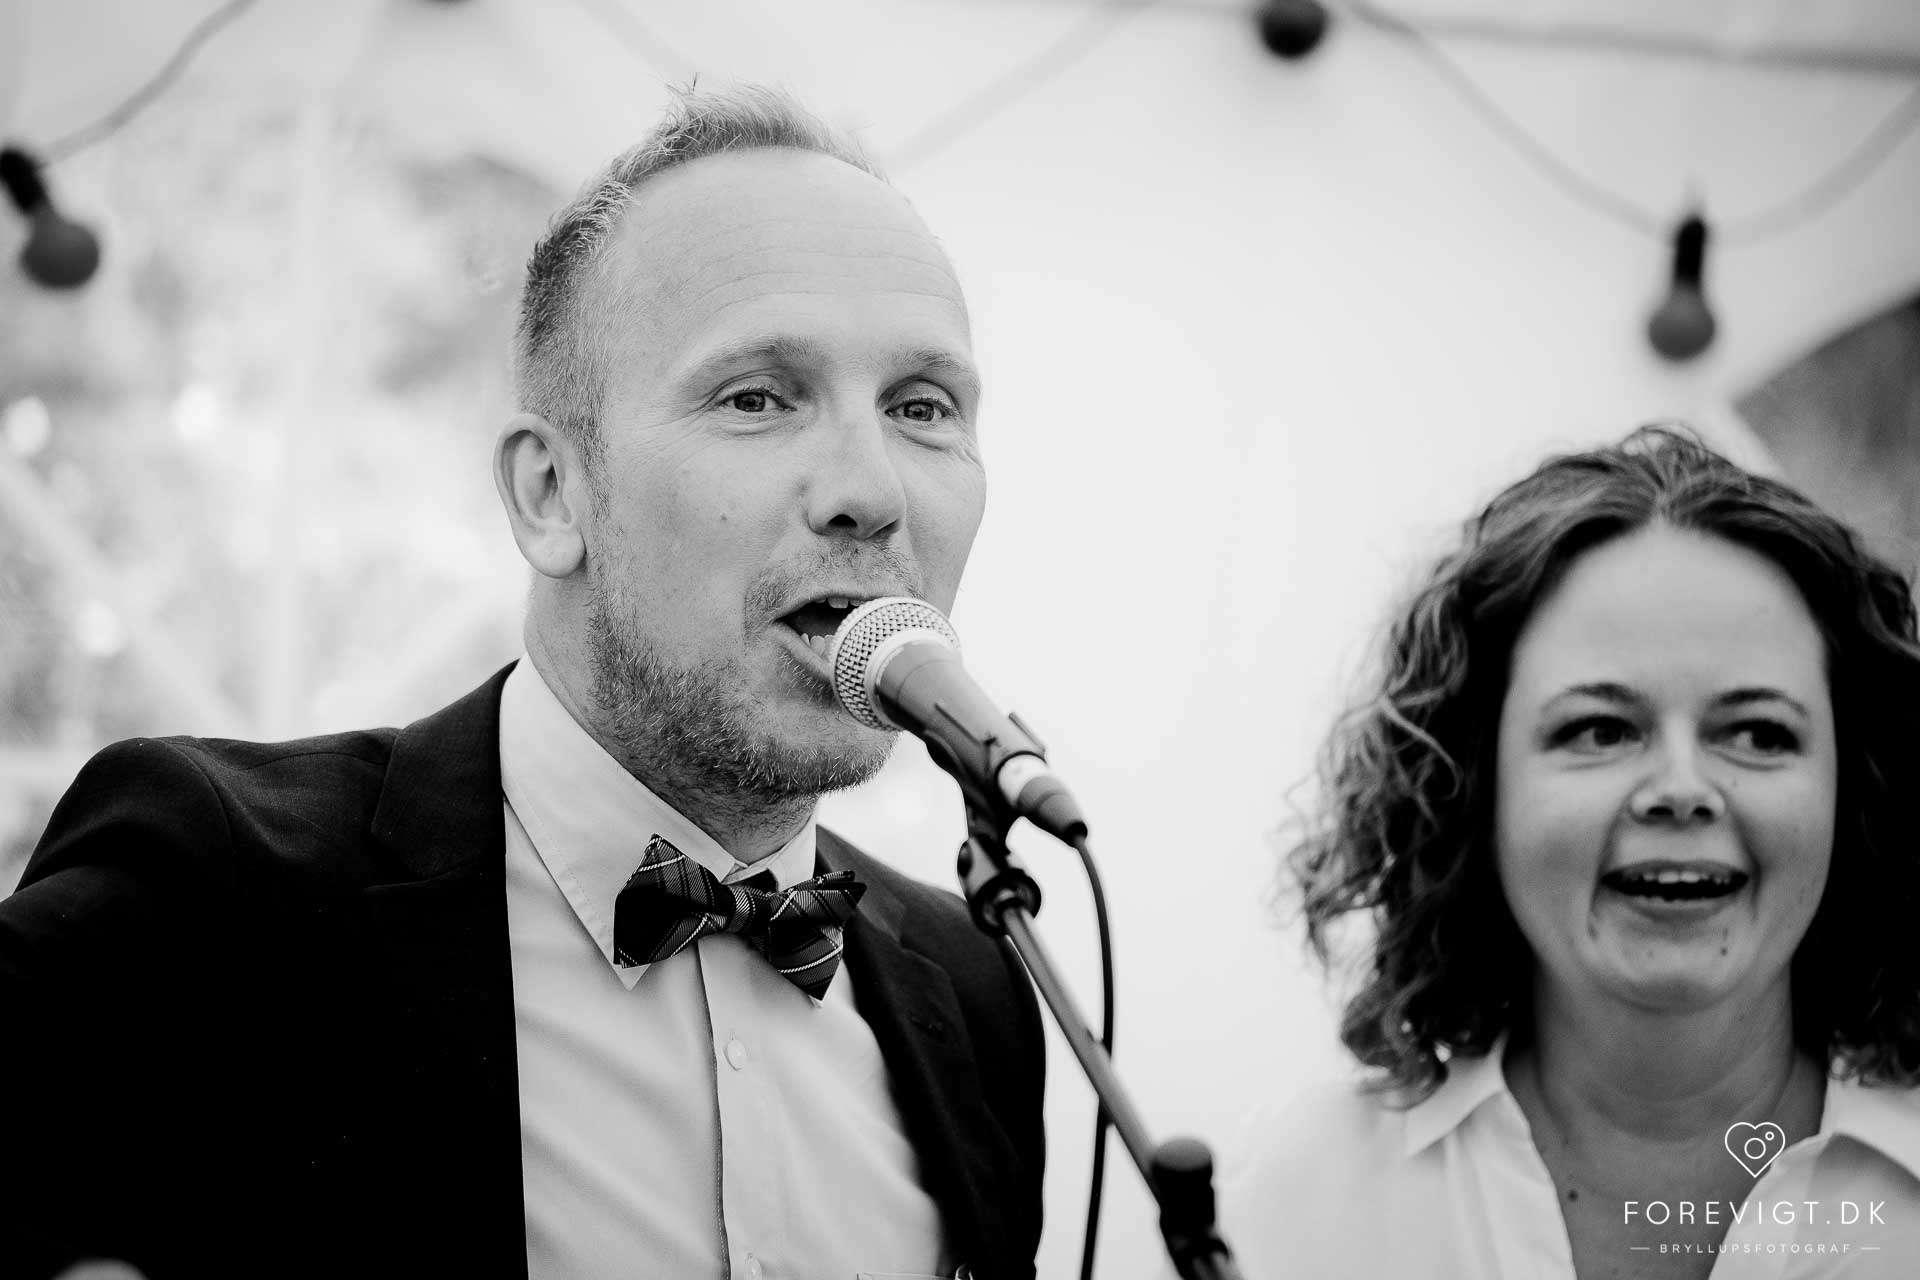 Bryllupsfotografering Aarhus Jylland, fotograf til bryllup